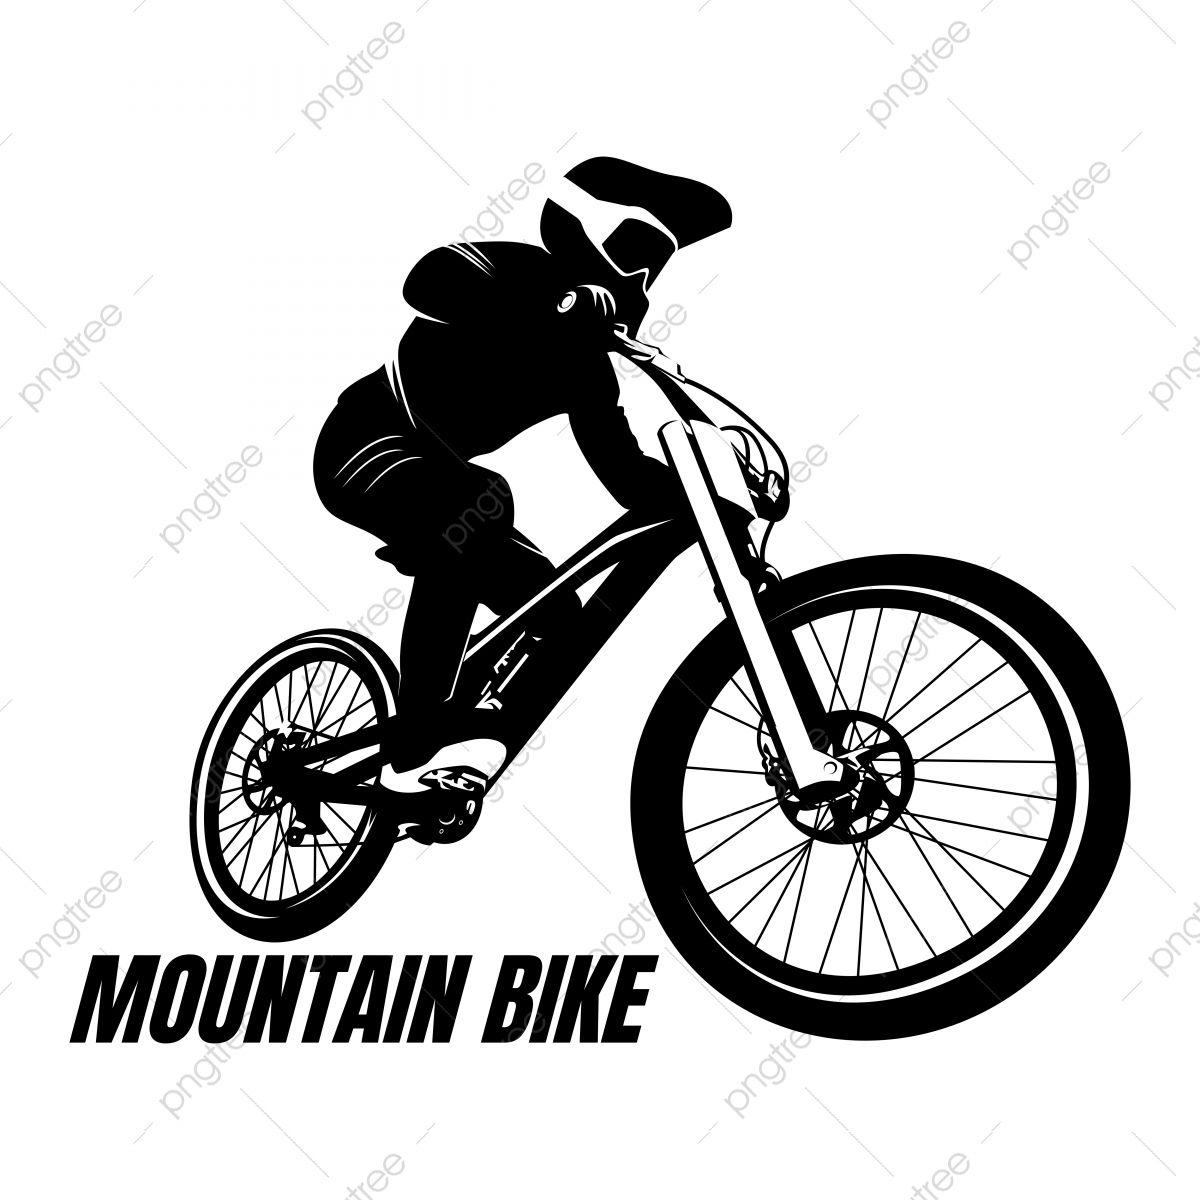 Mountain Bike Png File